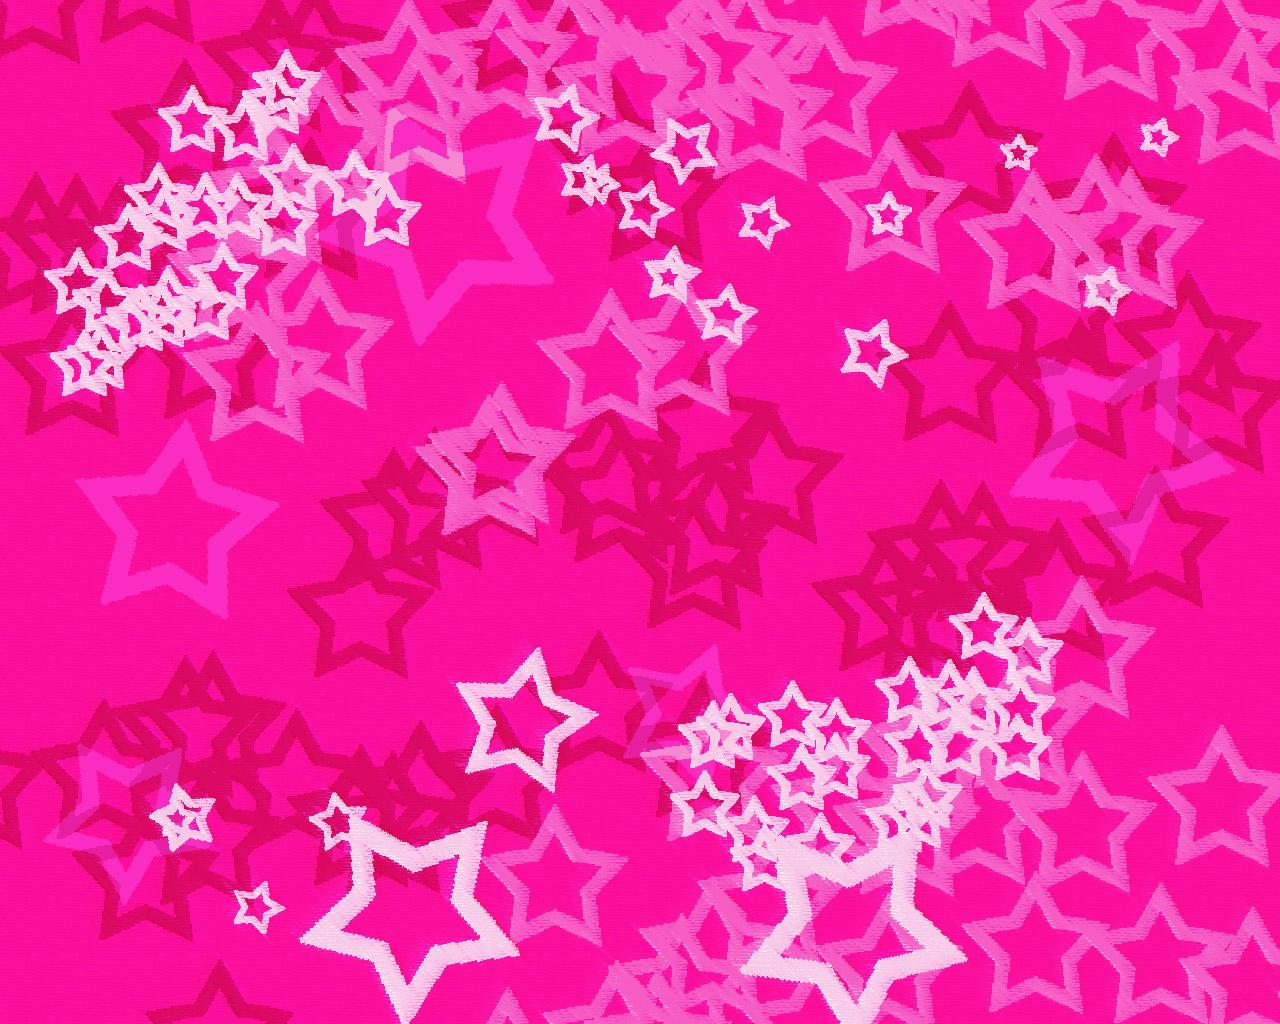 pink wallpaper pink wallpaper pink wallpaper pink wallpaper pink 1280x1024